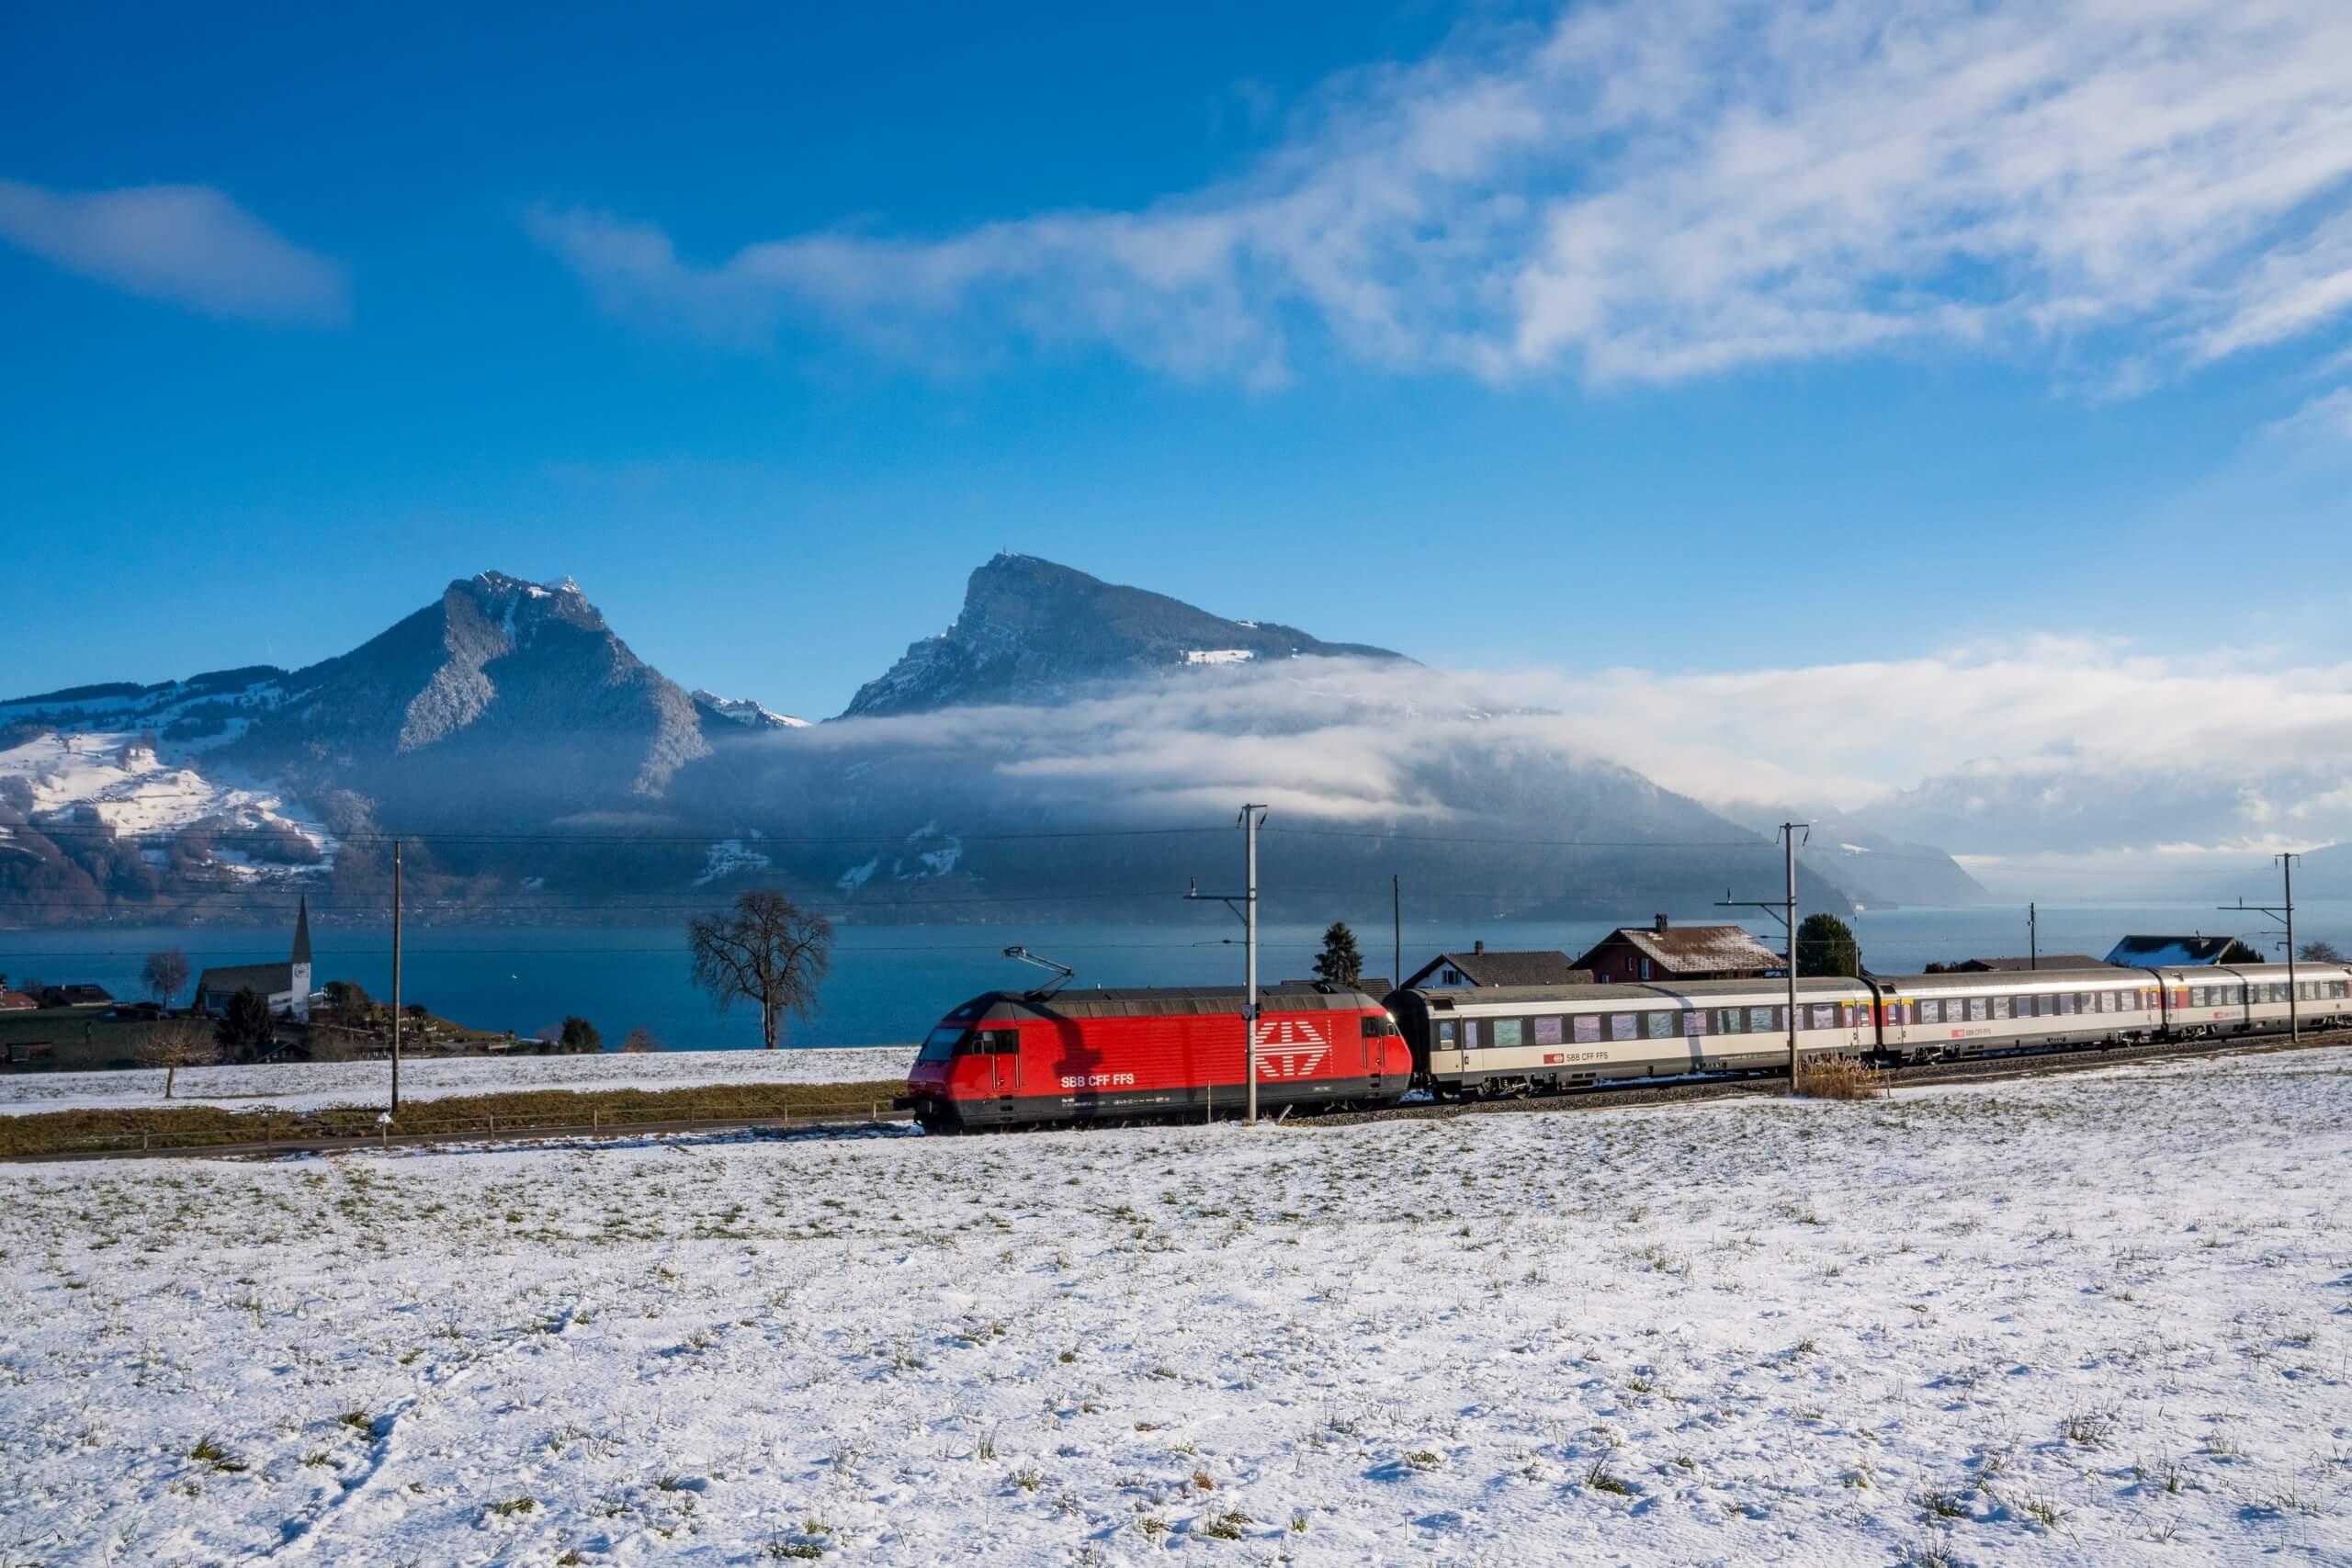 bls-bahnfahrt-winter-panorama-thunersee-zug